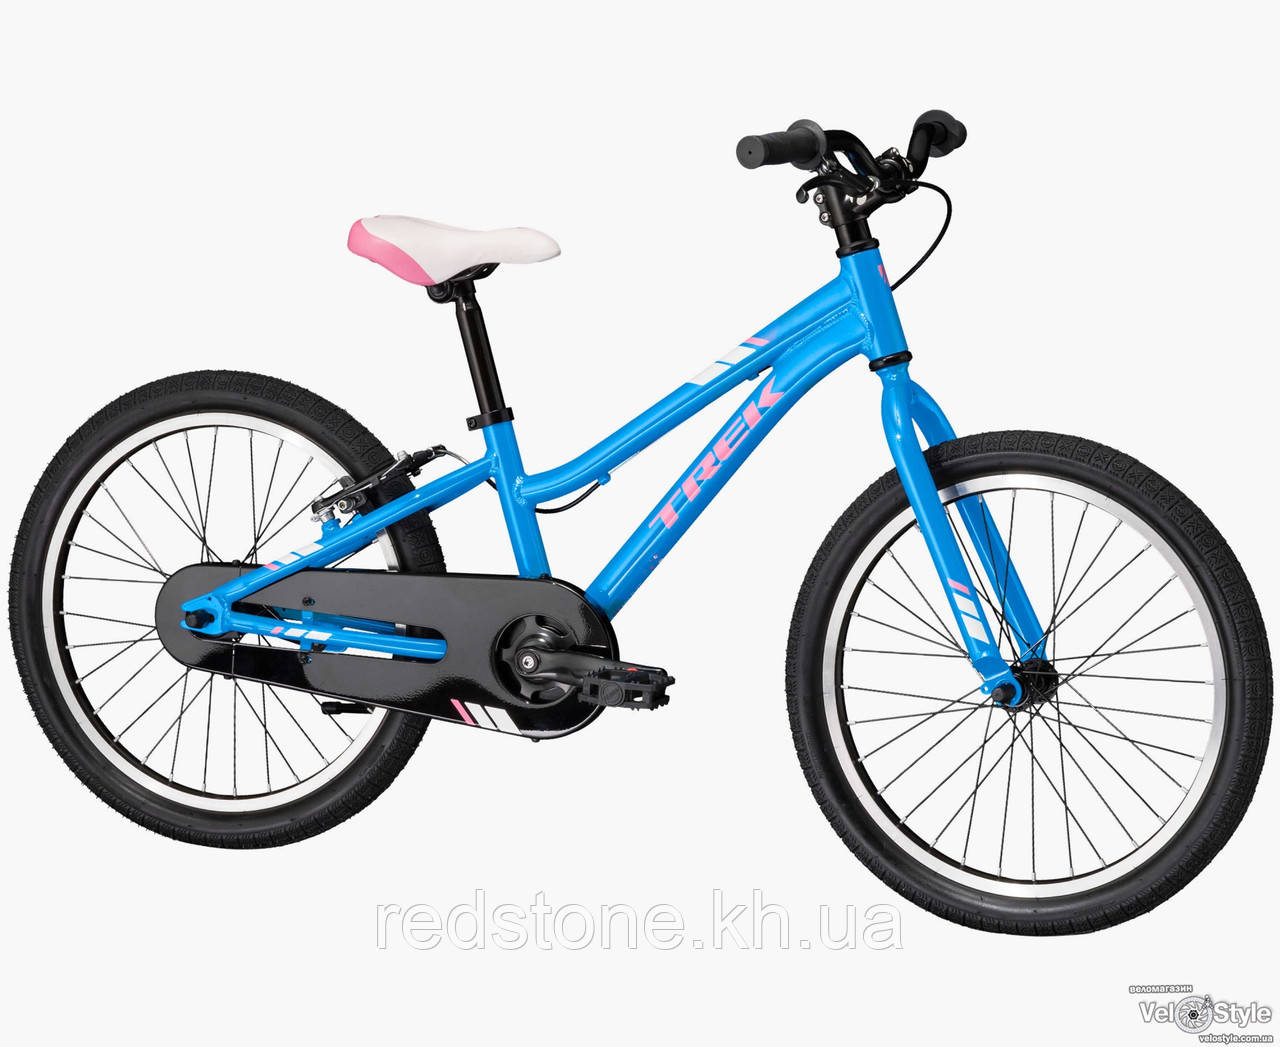 Велосипед TREK PRECALIBER 20 SS GIRLS синий, колеса 20¨